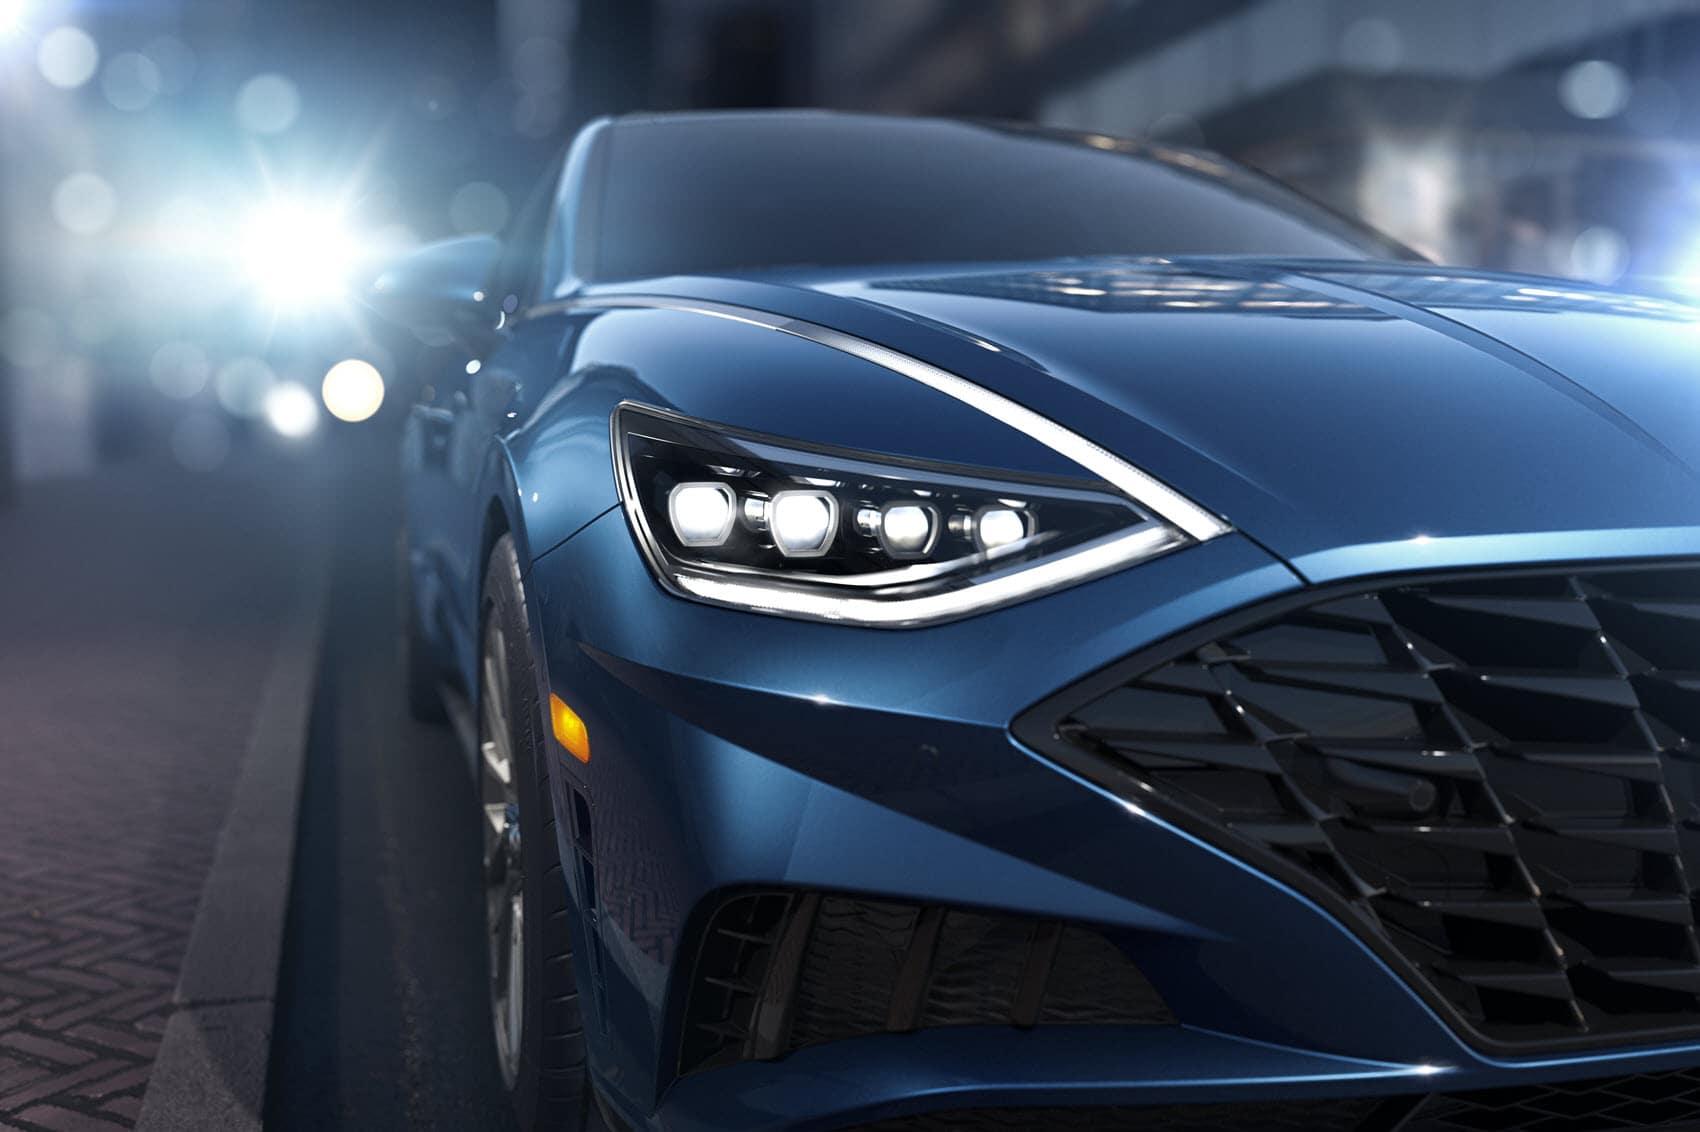 2020 Hyundai Sonata Engine Specs